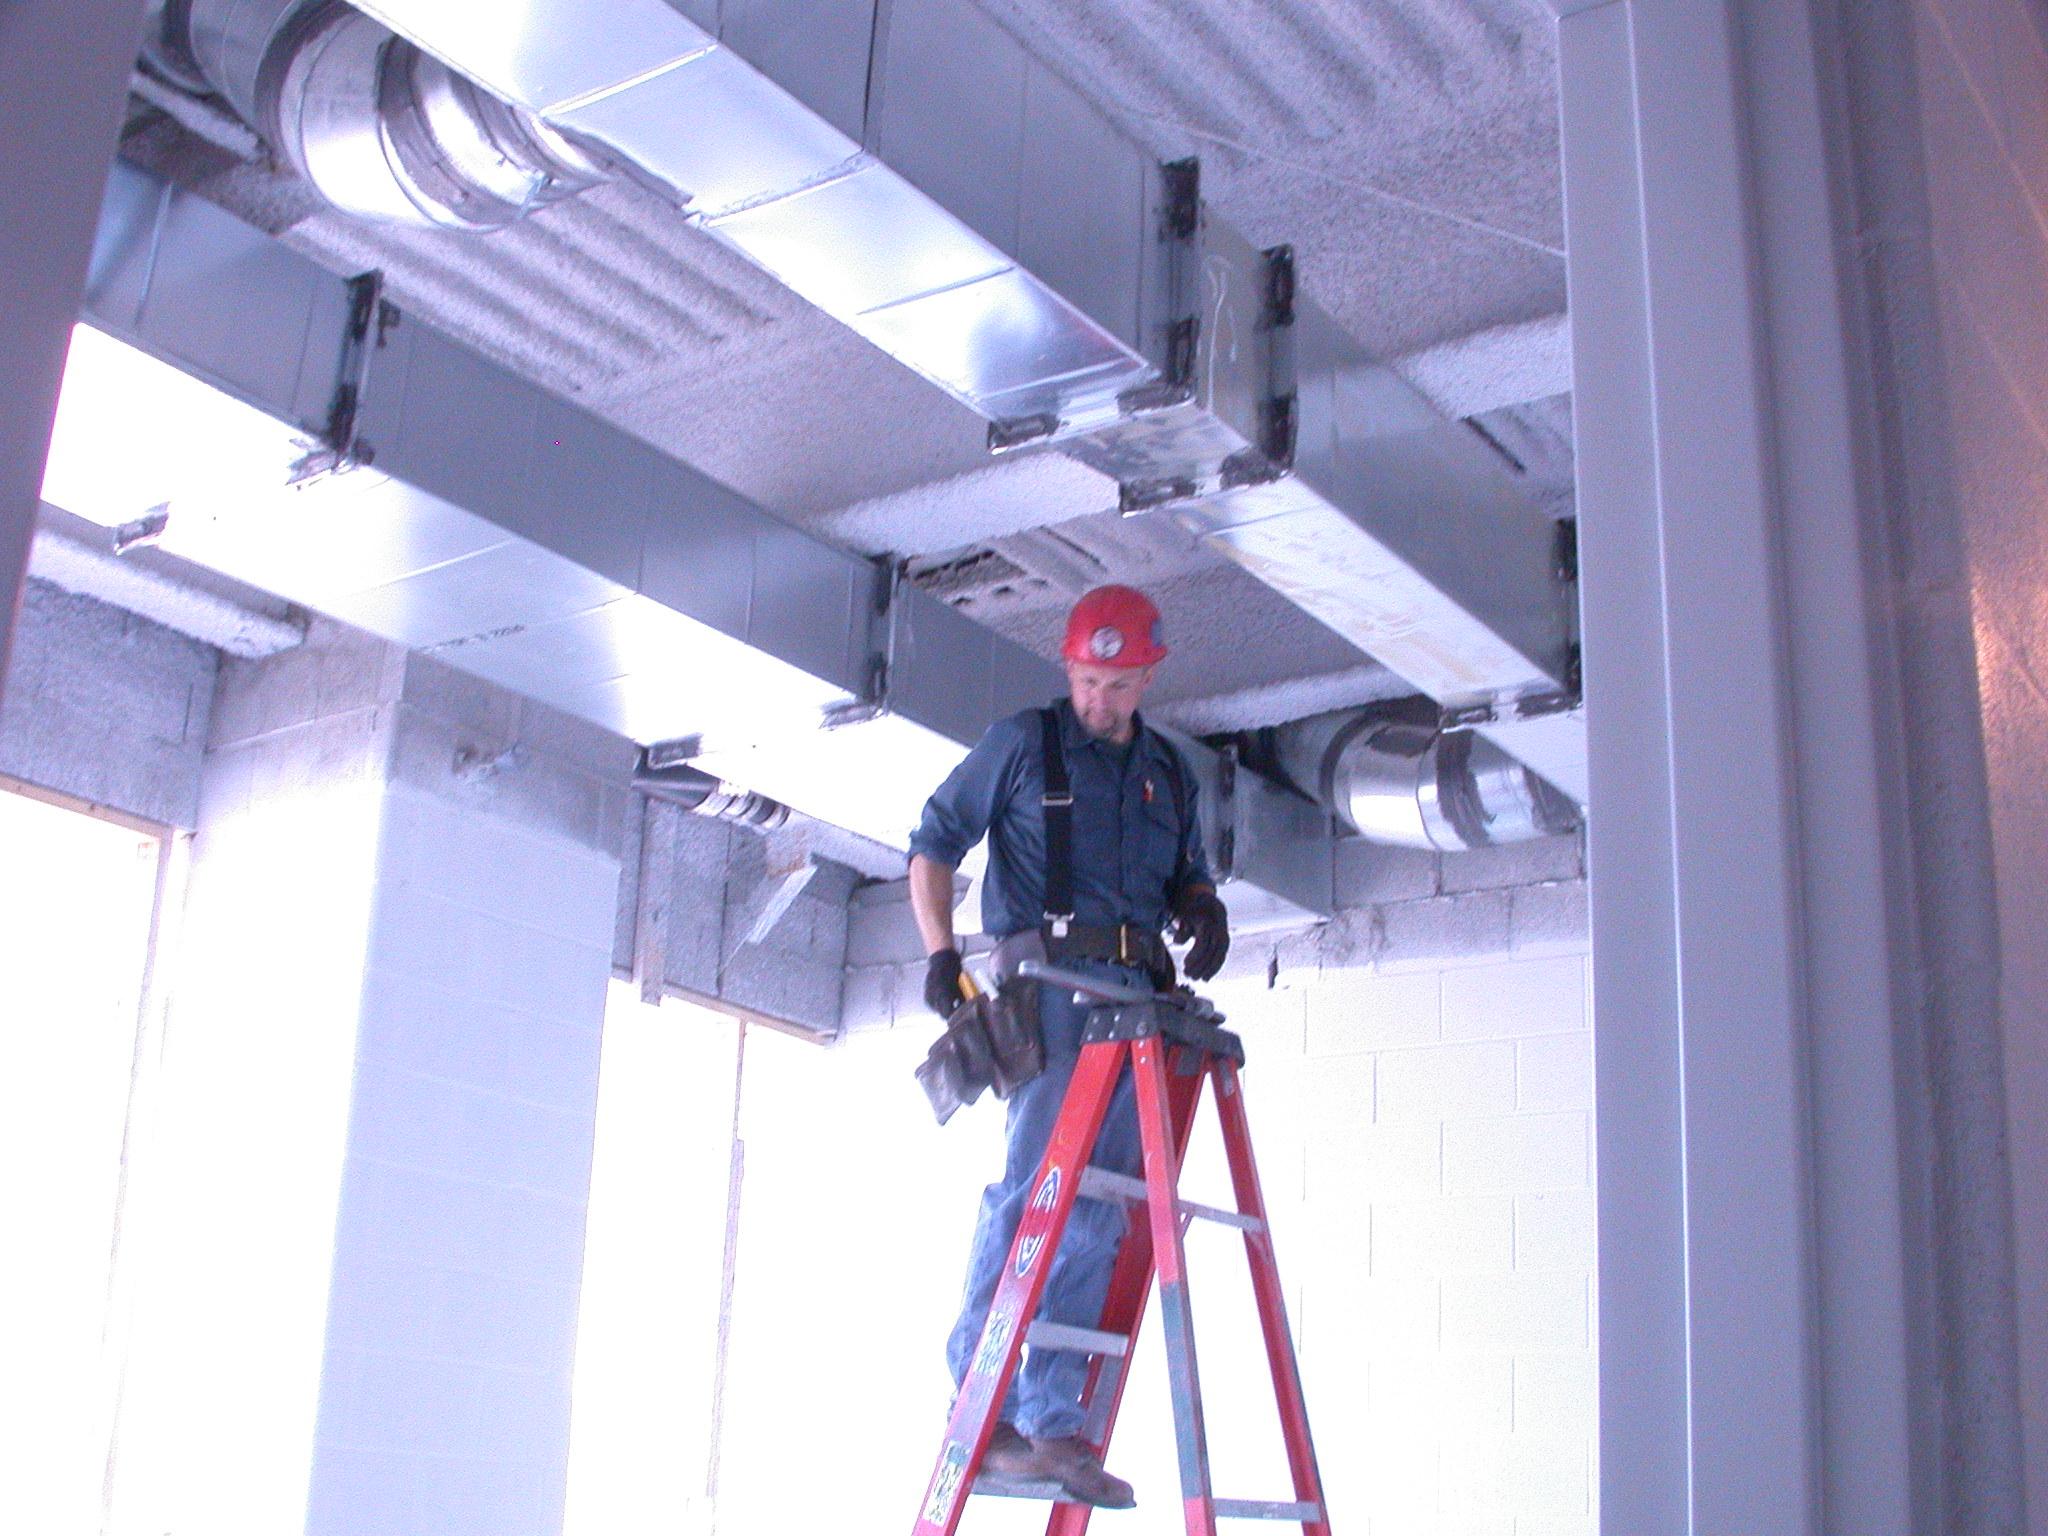 Fire Sprinkler Installation and Special Hazards